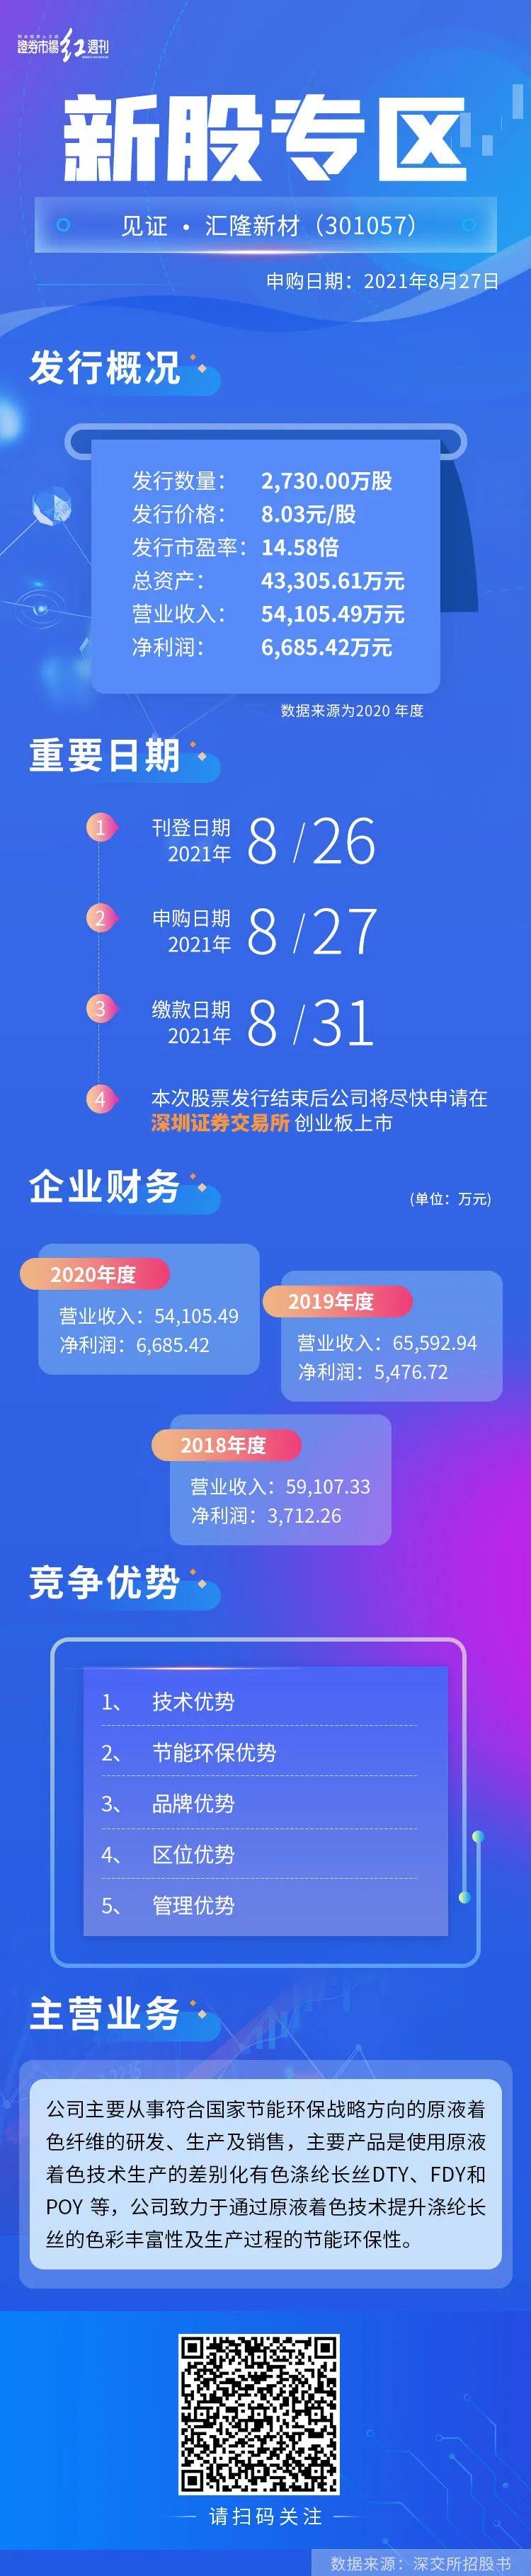 IPO速递 | 汇隆新材、中铁特货申购一览